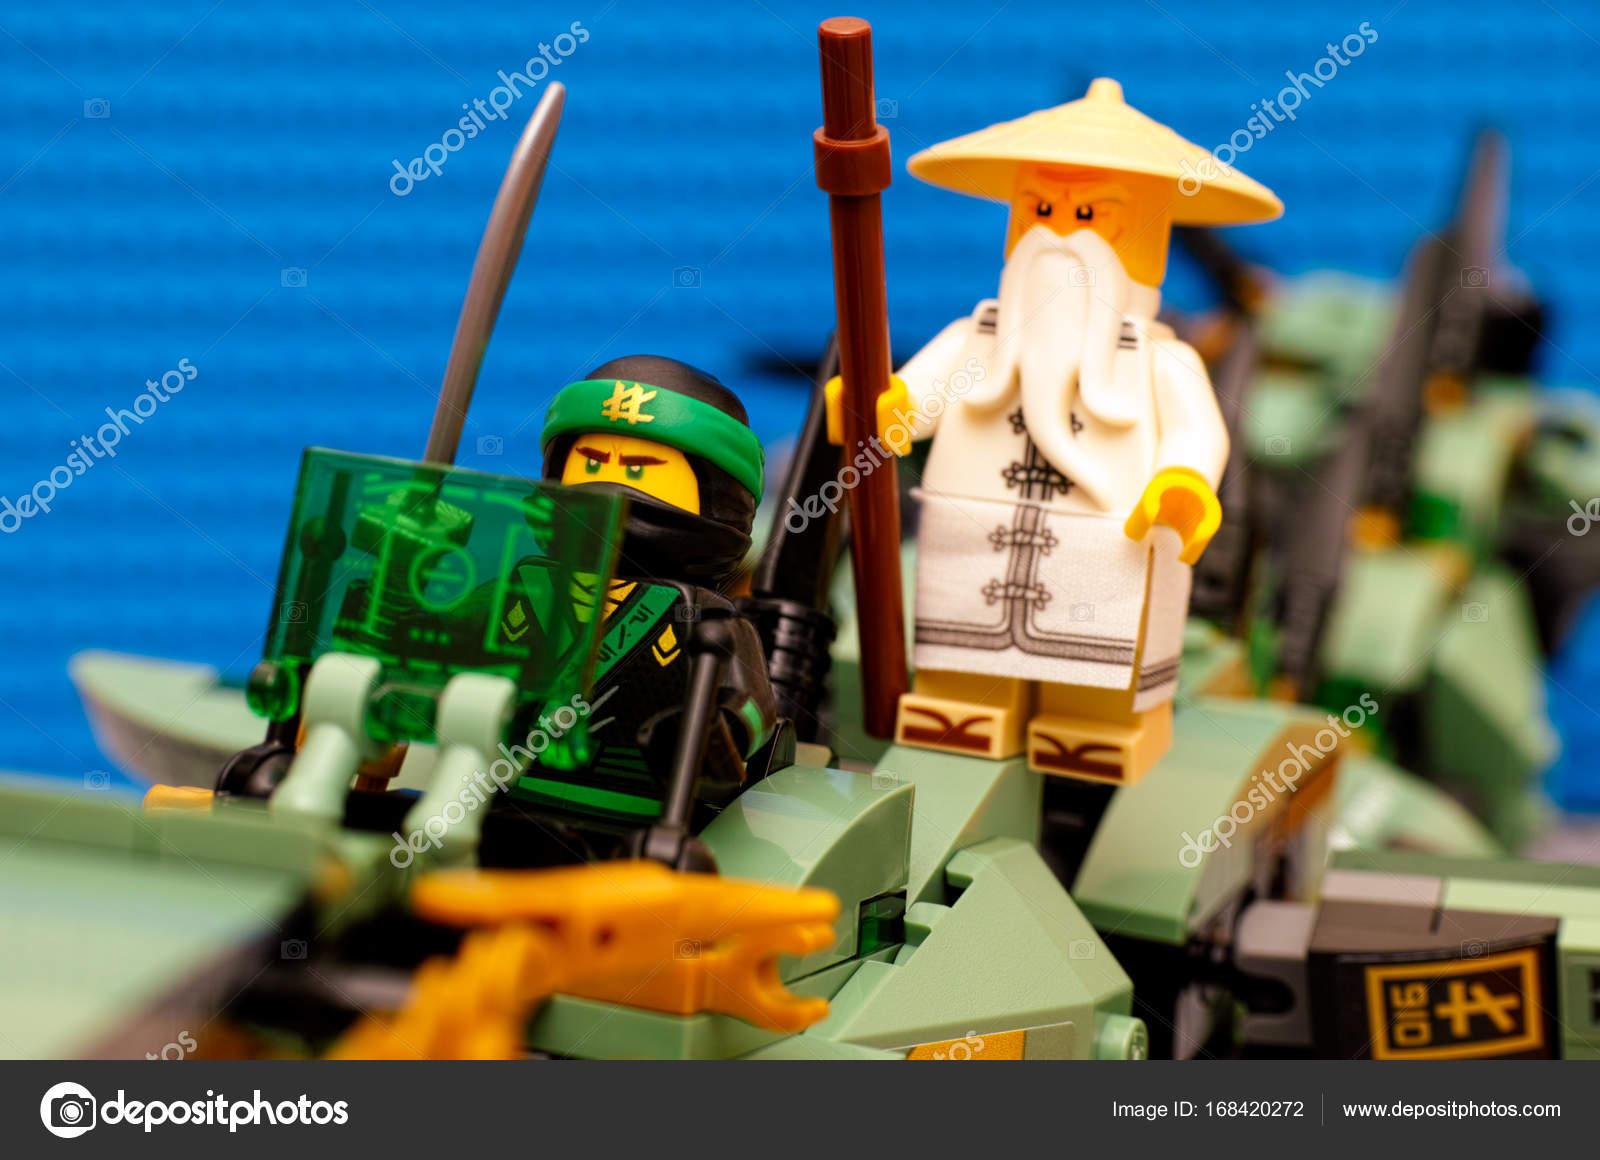 Blue Ninjago Image Lego Ninjago Movie The Green Ninja And Wu Flying On Green Ninja Stock Editorial Photo C Rosinka79 168420272